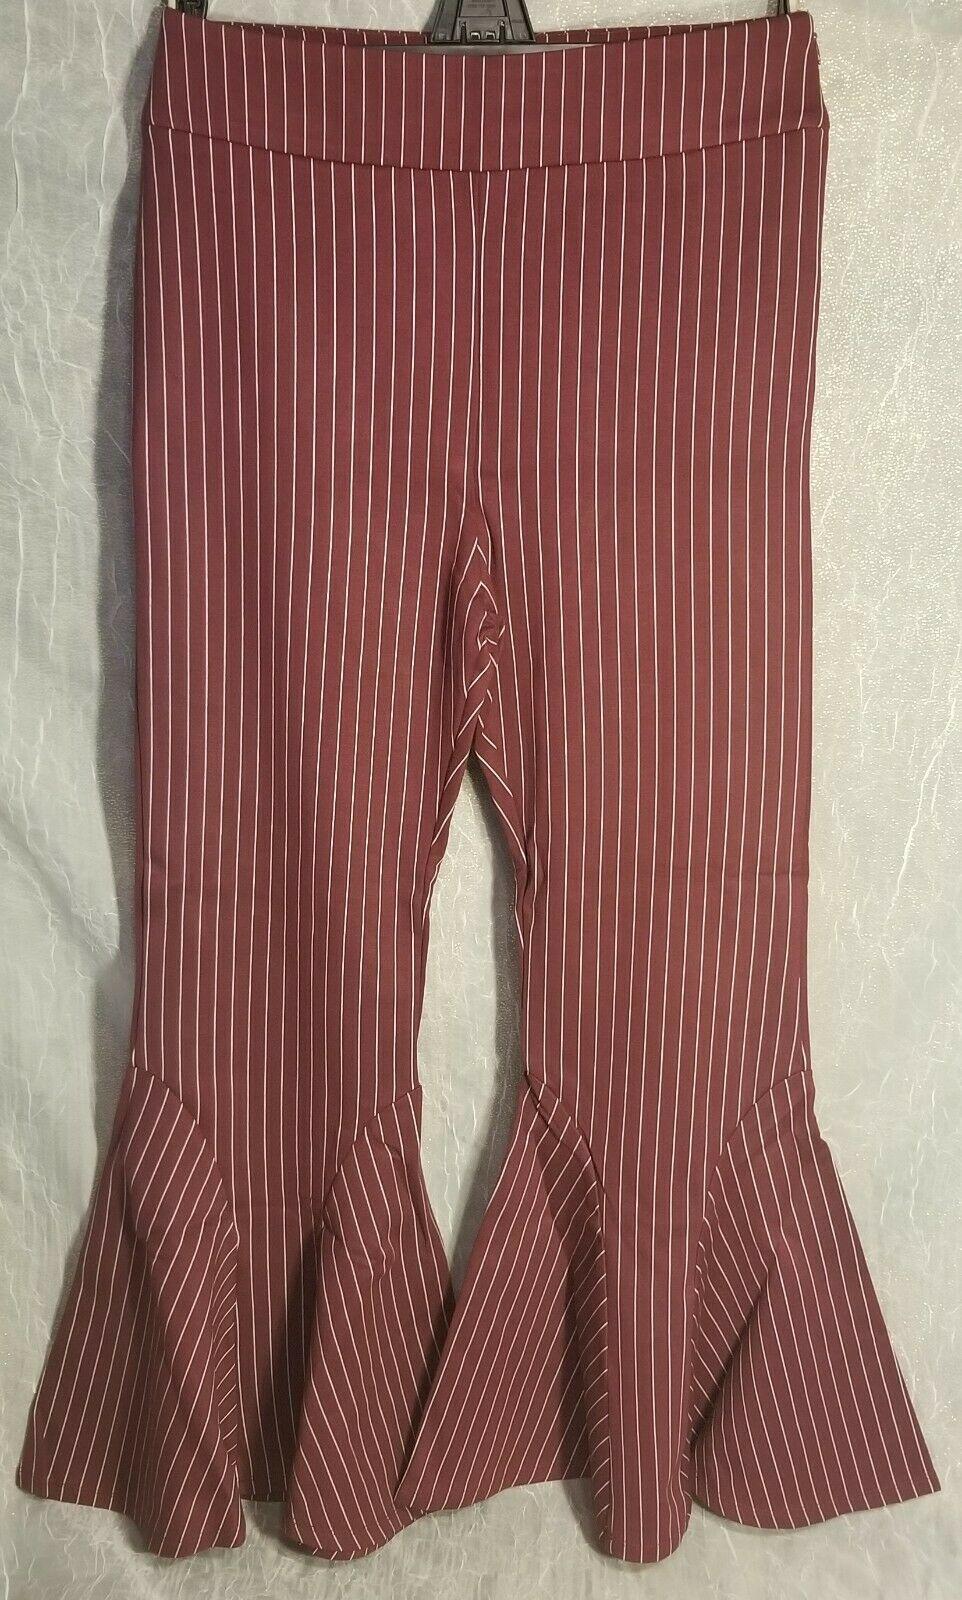 New free people Mari Ponte Pants 6625 Winterberry Striped Size 10 Stretch